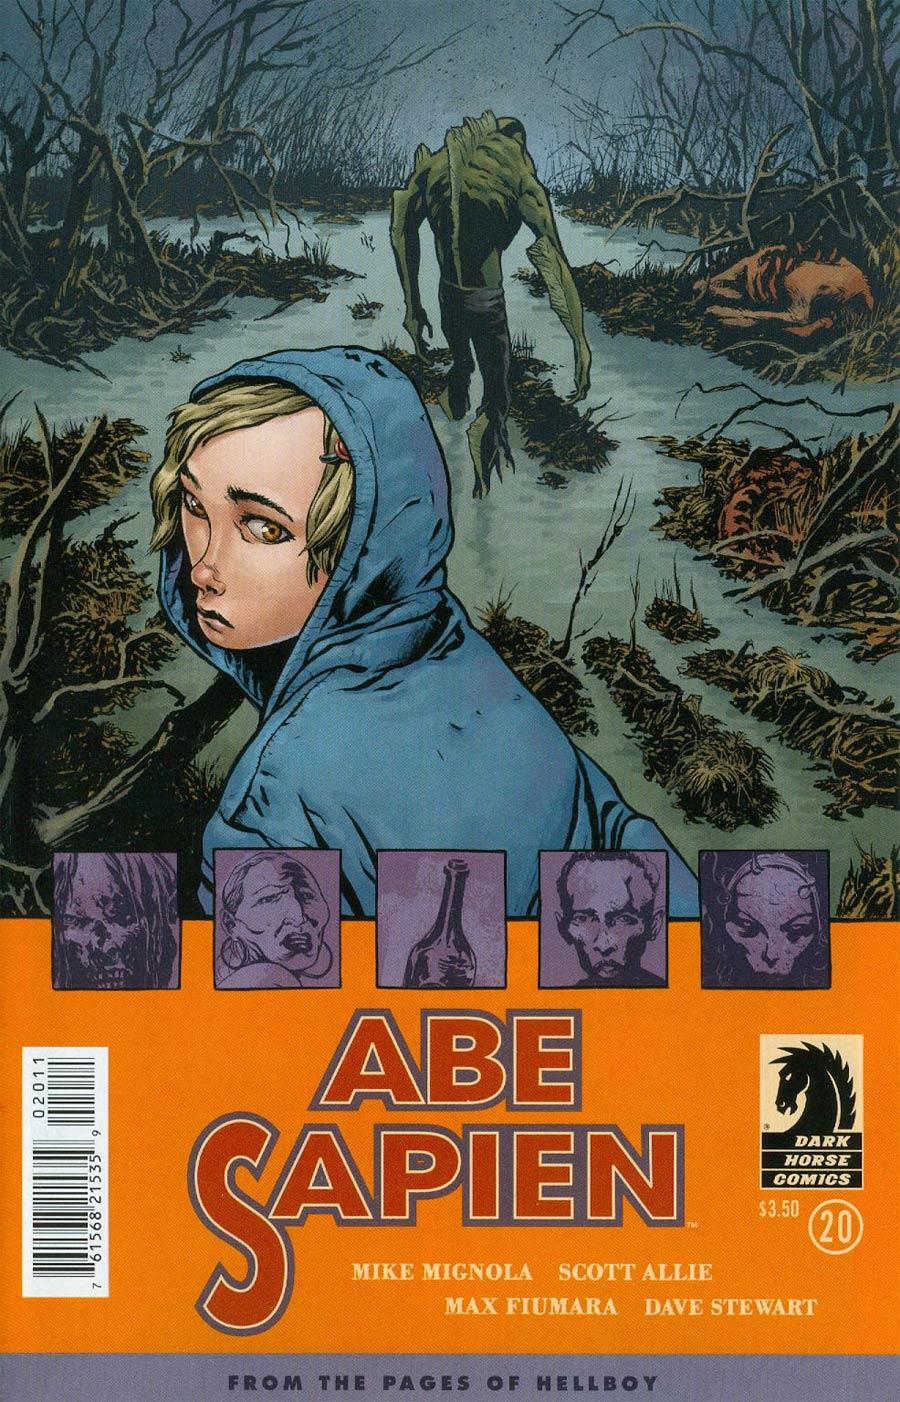 Abe Sapien #20